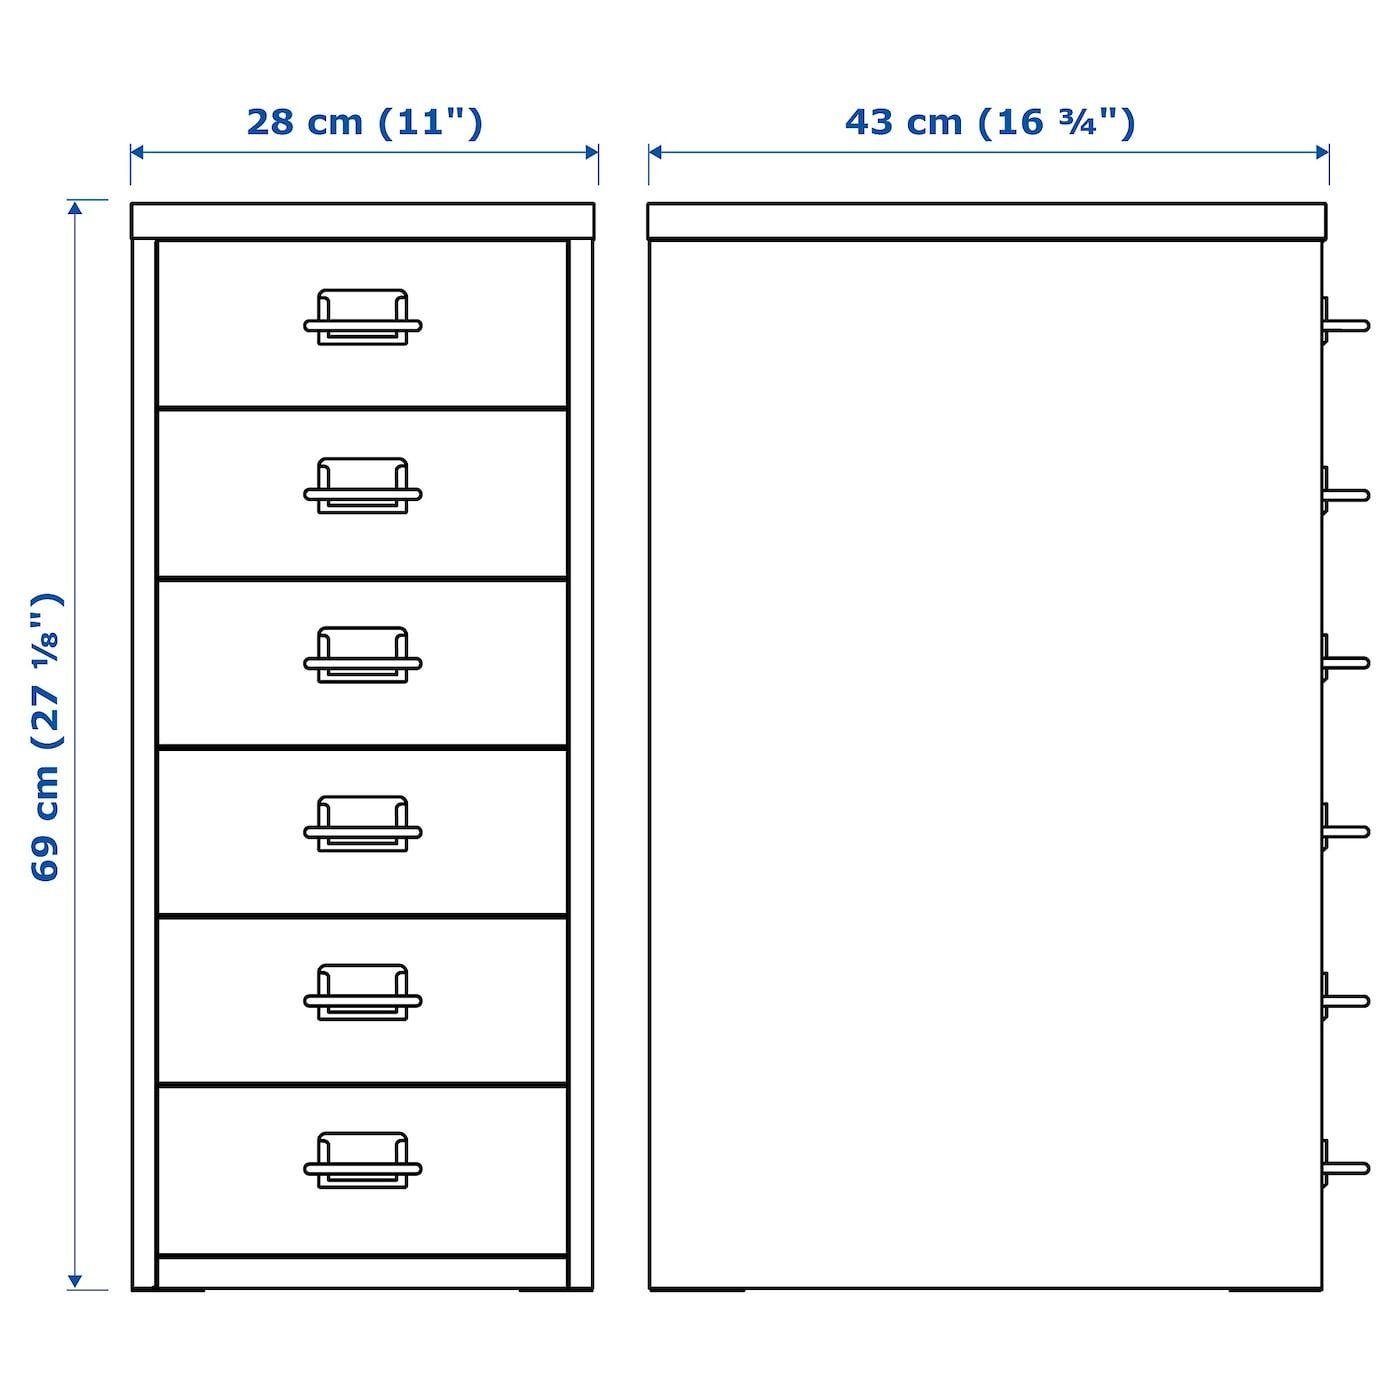 Helmer Cassettiera Con Rotelle.Helmer Cassettiera Con Rotelle Bianco 28x69 Cm Ikea It In 2020 Drawer Unit Drawers Helmer